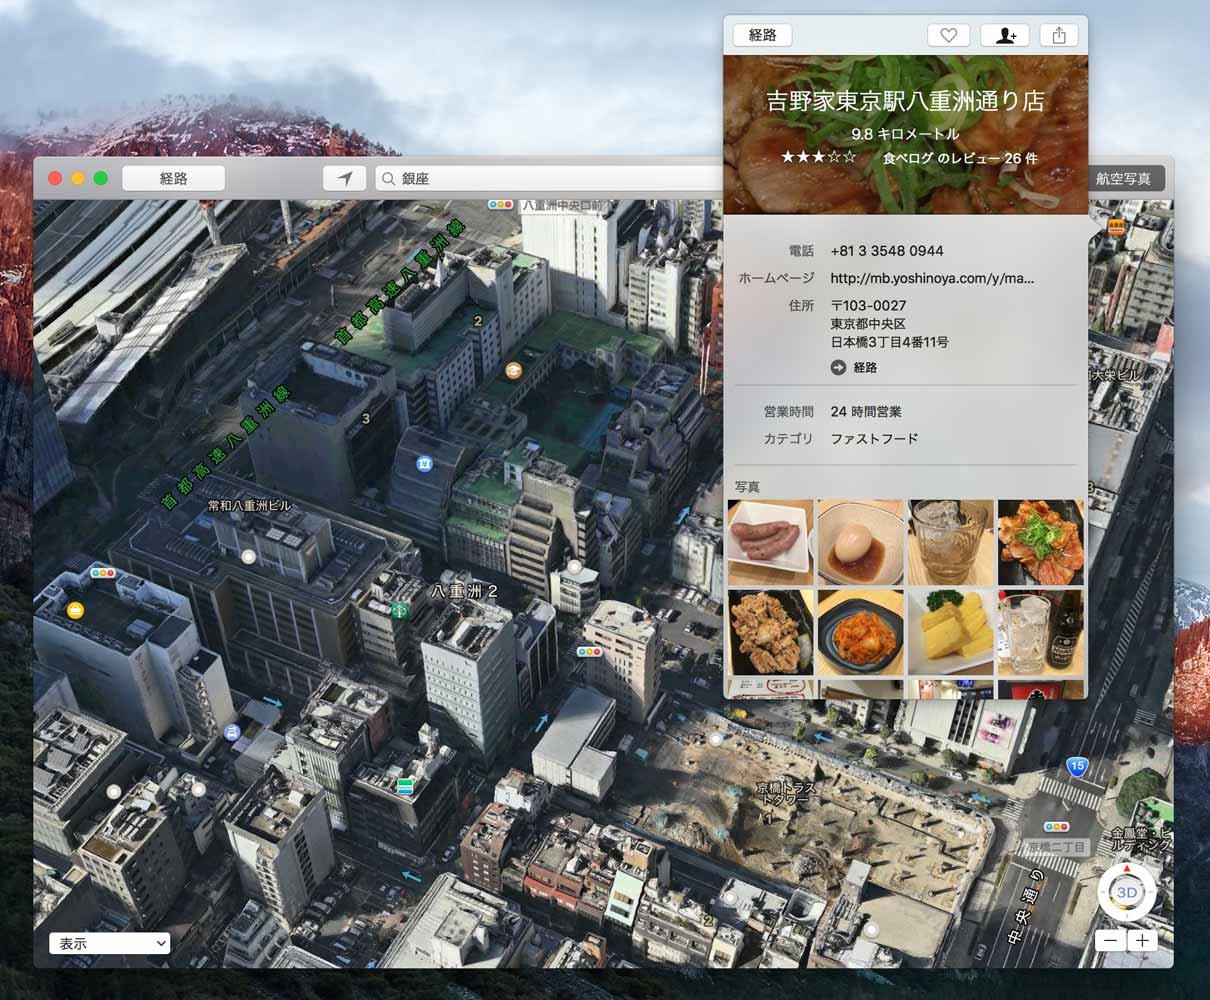 Apple、マップアプリで食べログの店舗情報を参照することが可能に